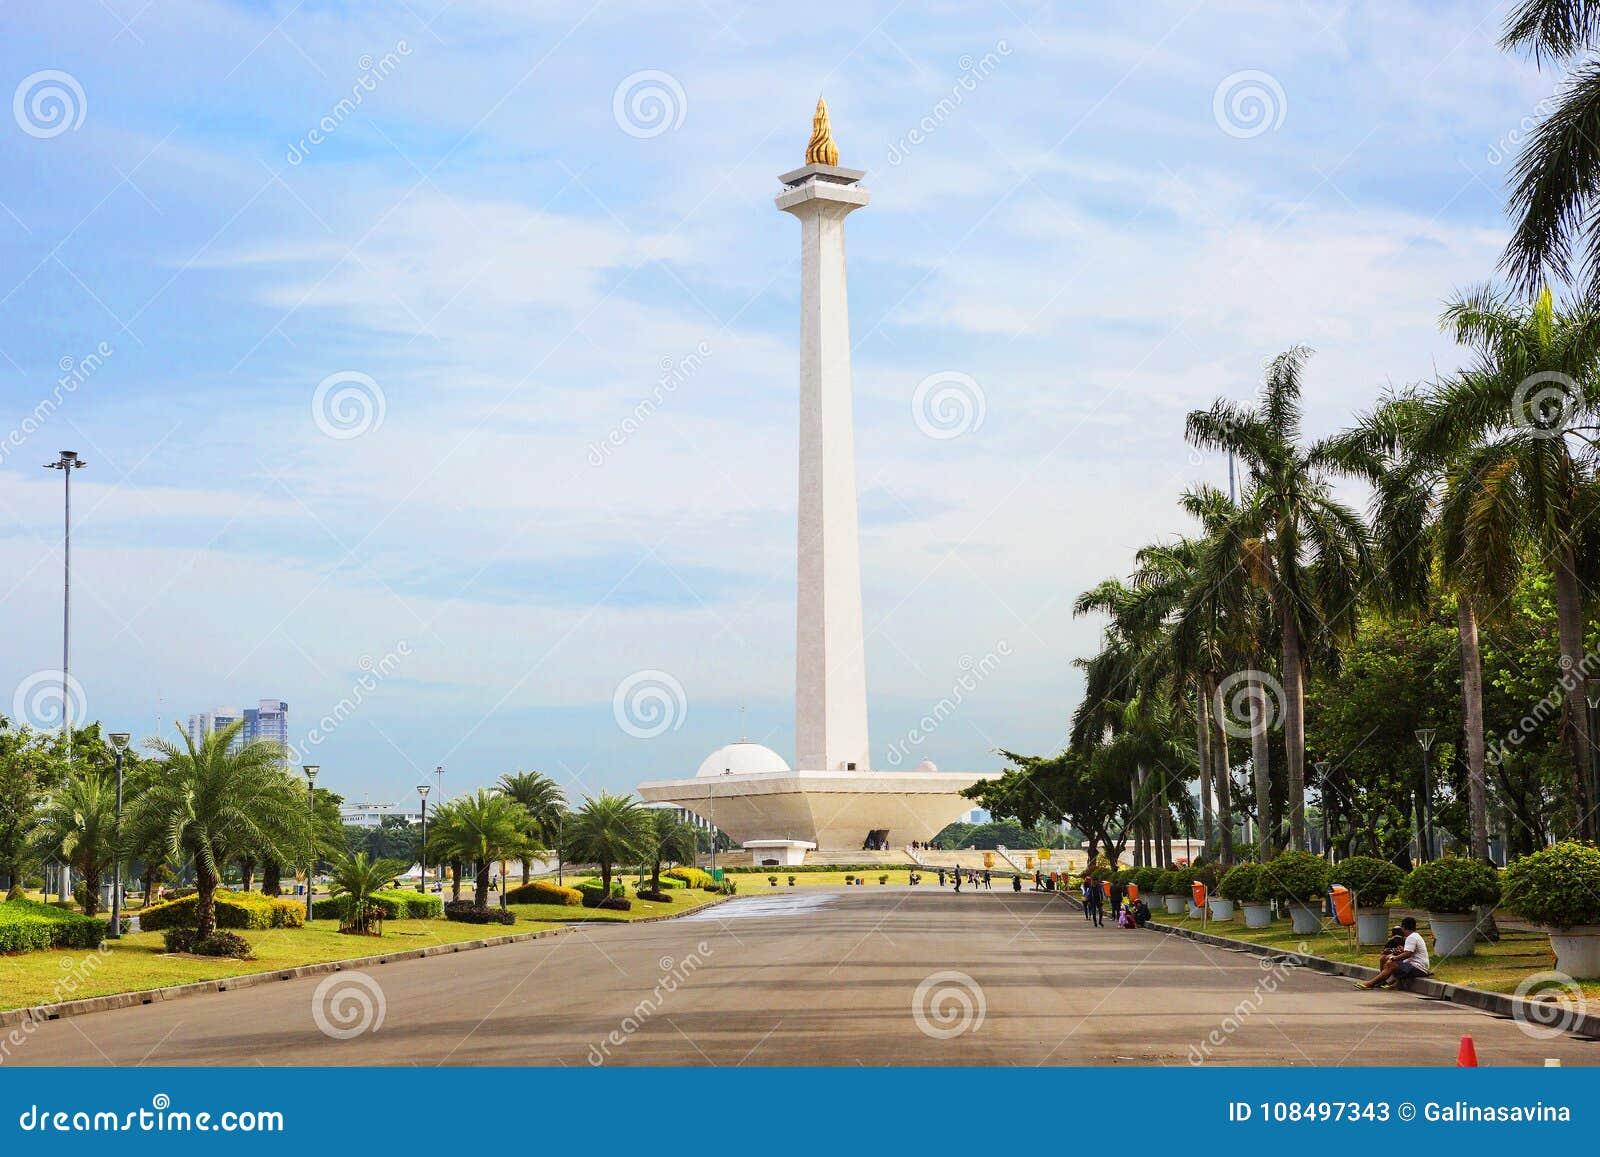 Indonesia. Jakarta. The national monument Monas